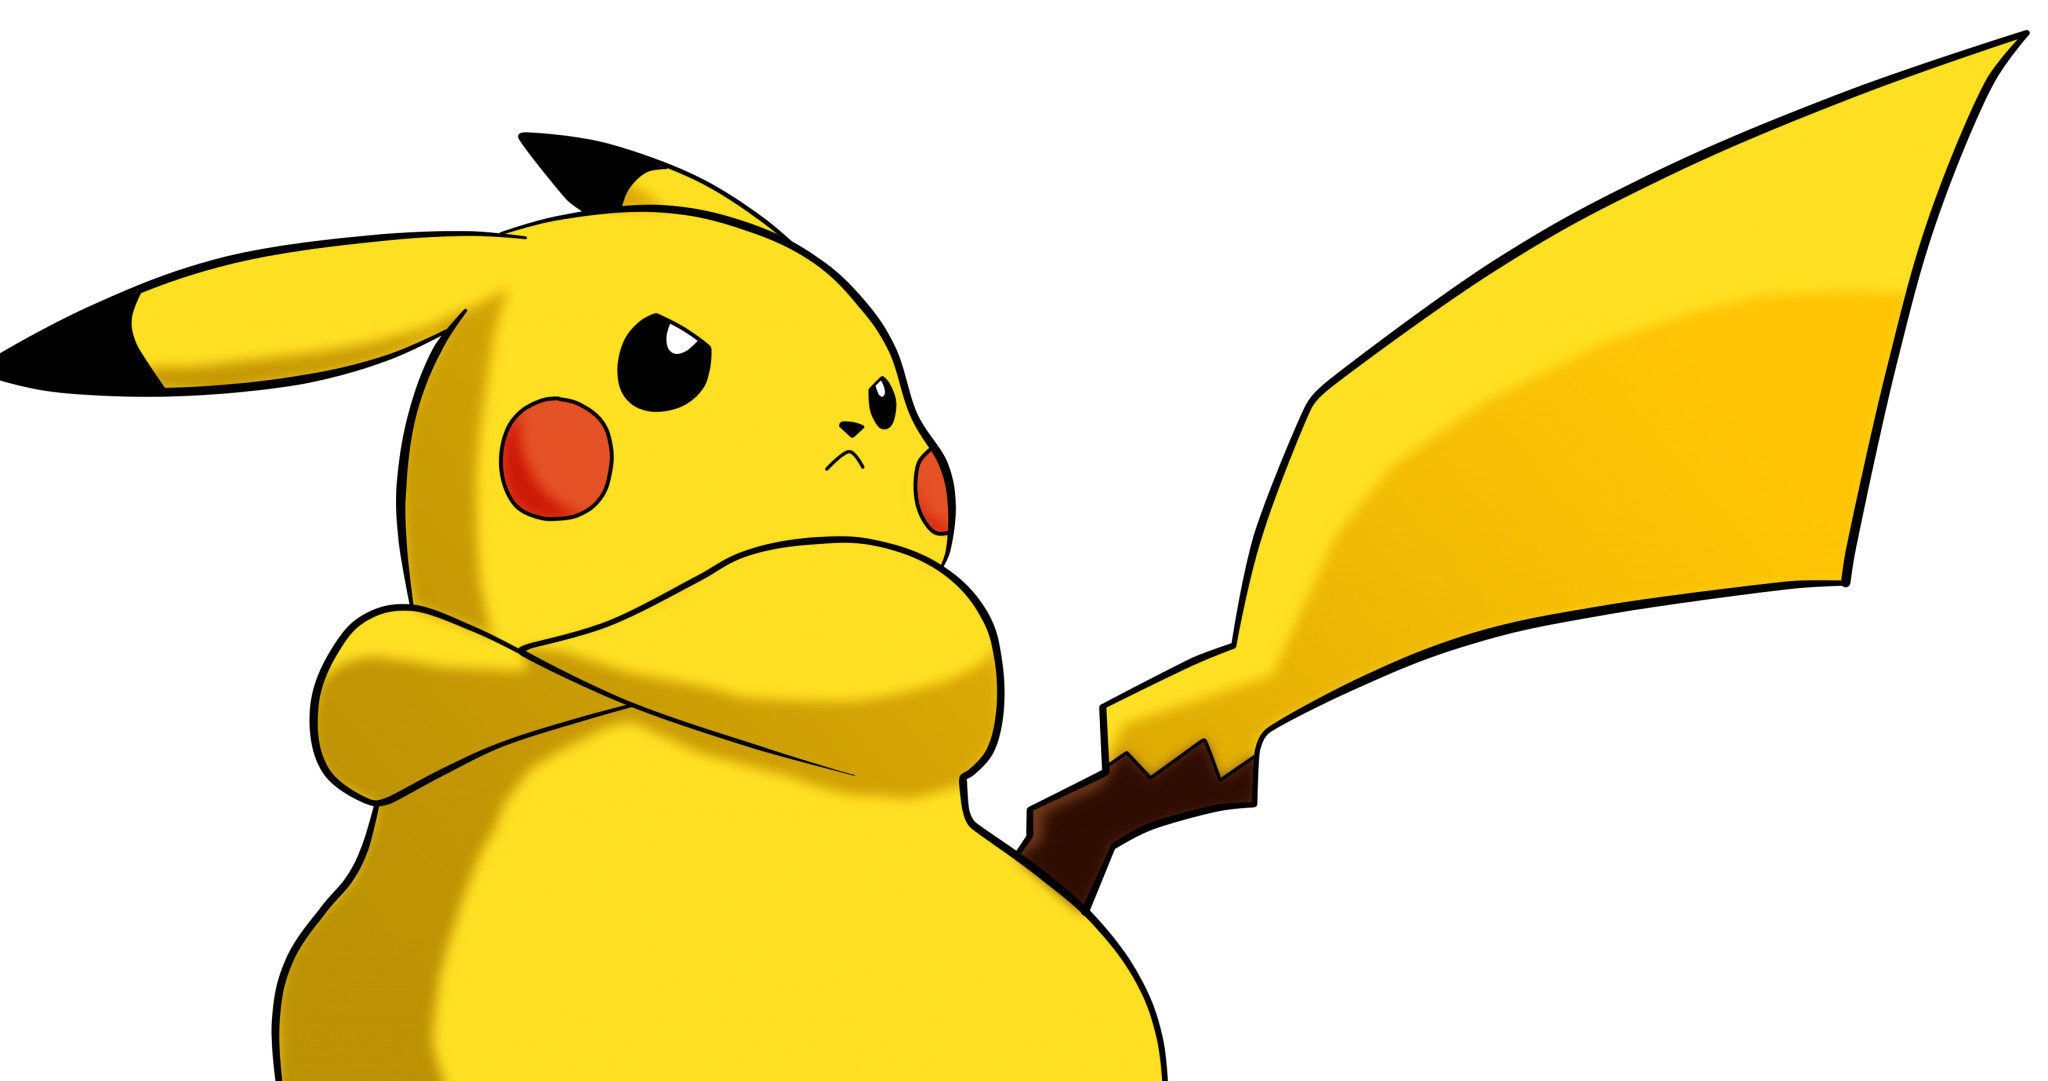 pikachu wallpaper free download